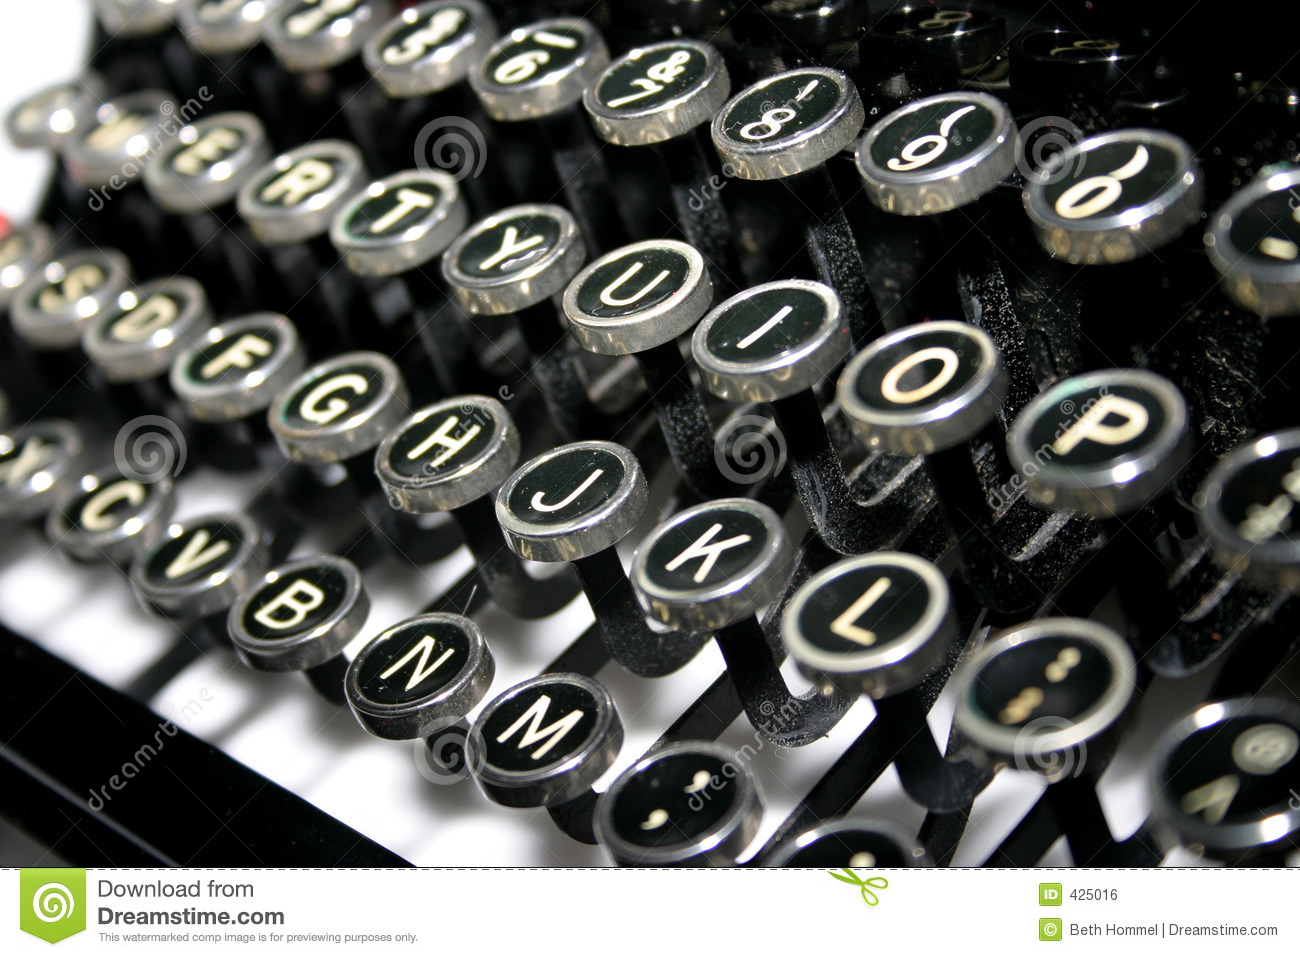 typewriter-keys-425016.jpg